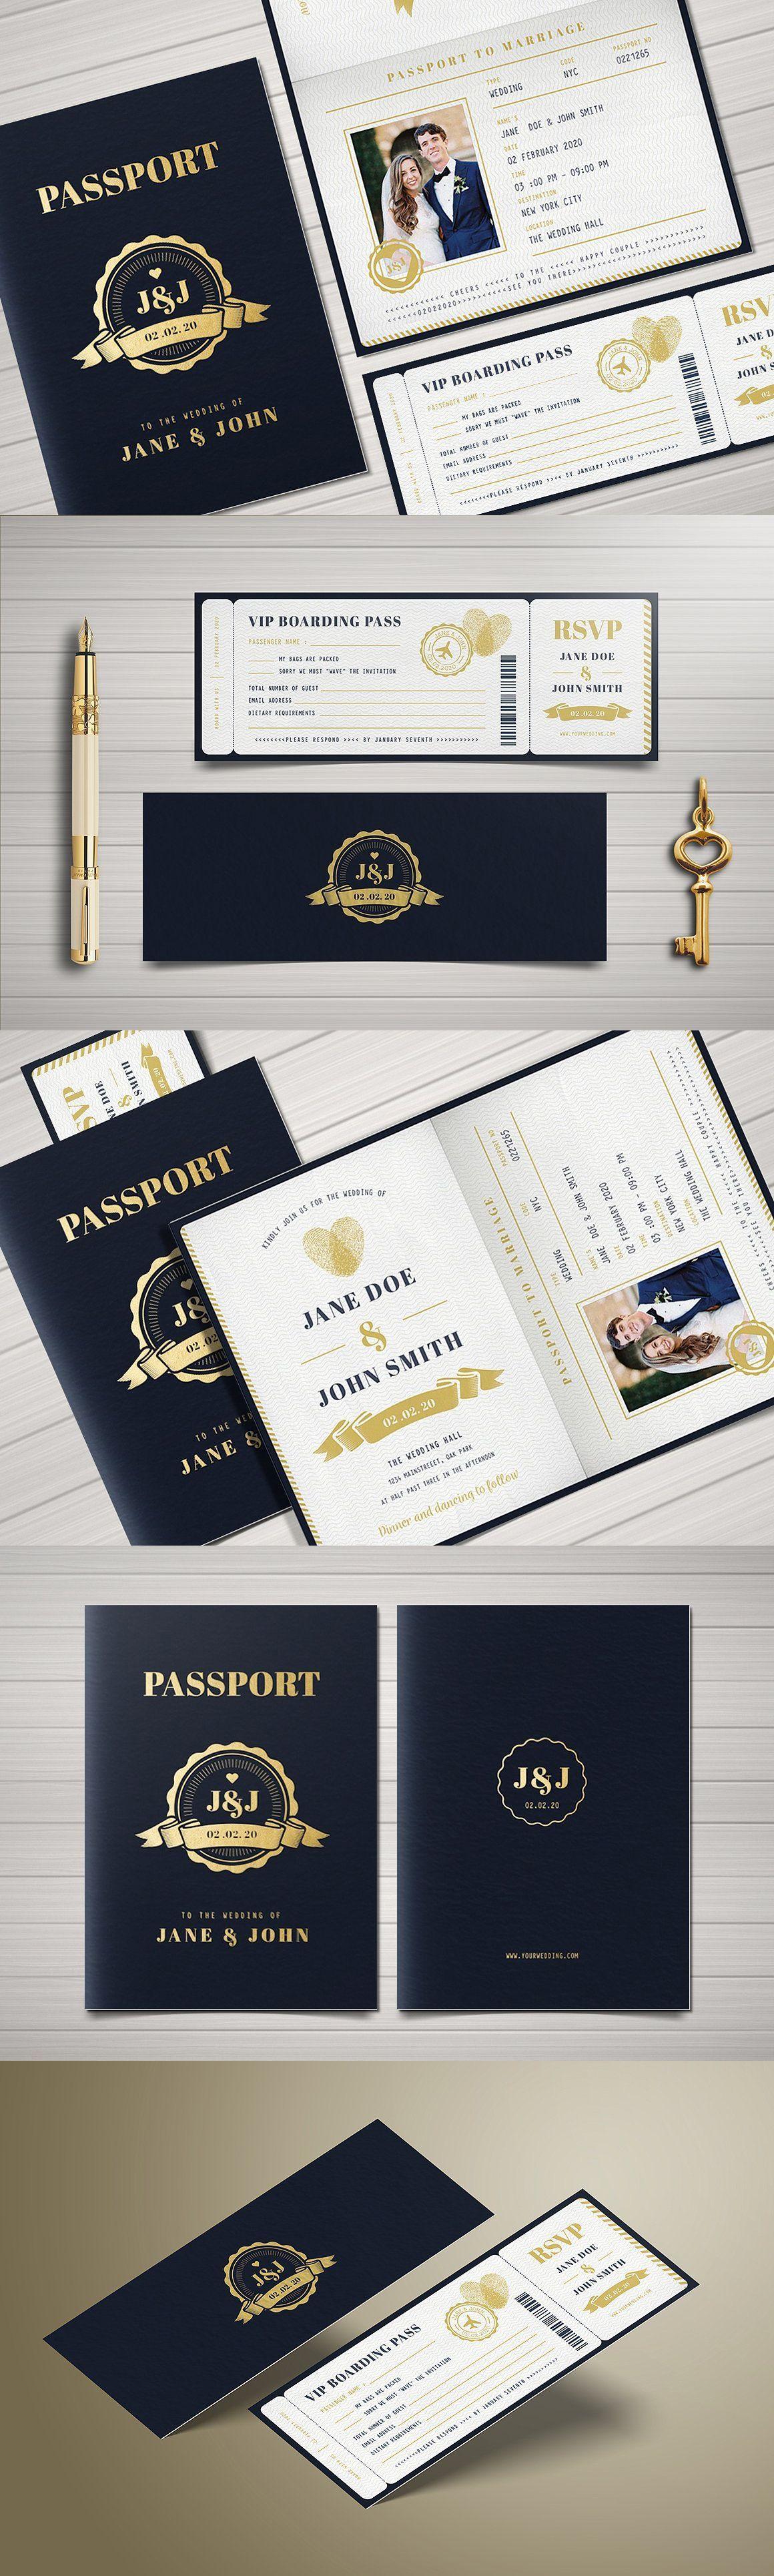 Passport Wedding Invitation Templates Psd Ai Weddinginvitation Passport Wedding Invitations Passport Invitations Travel Wedding Invitations